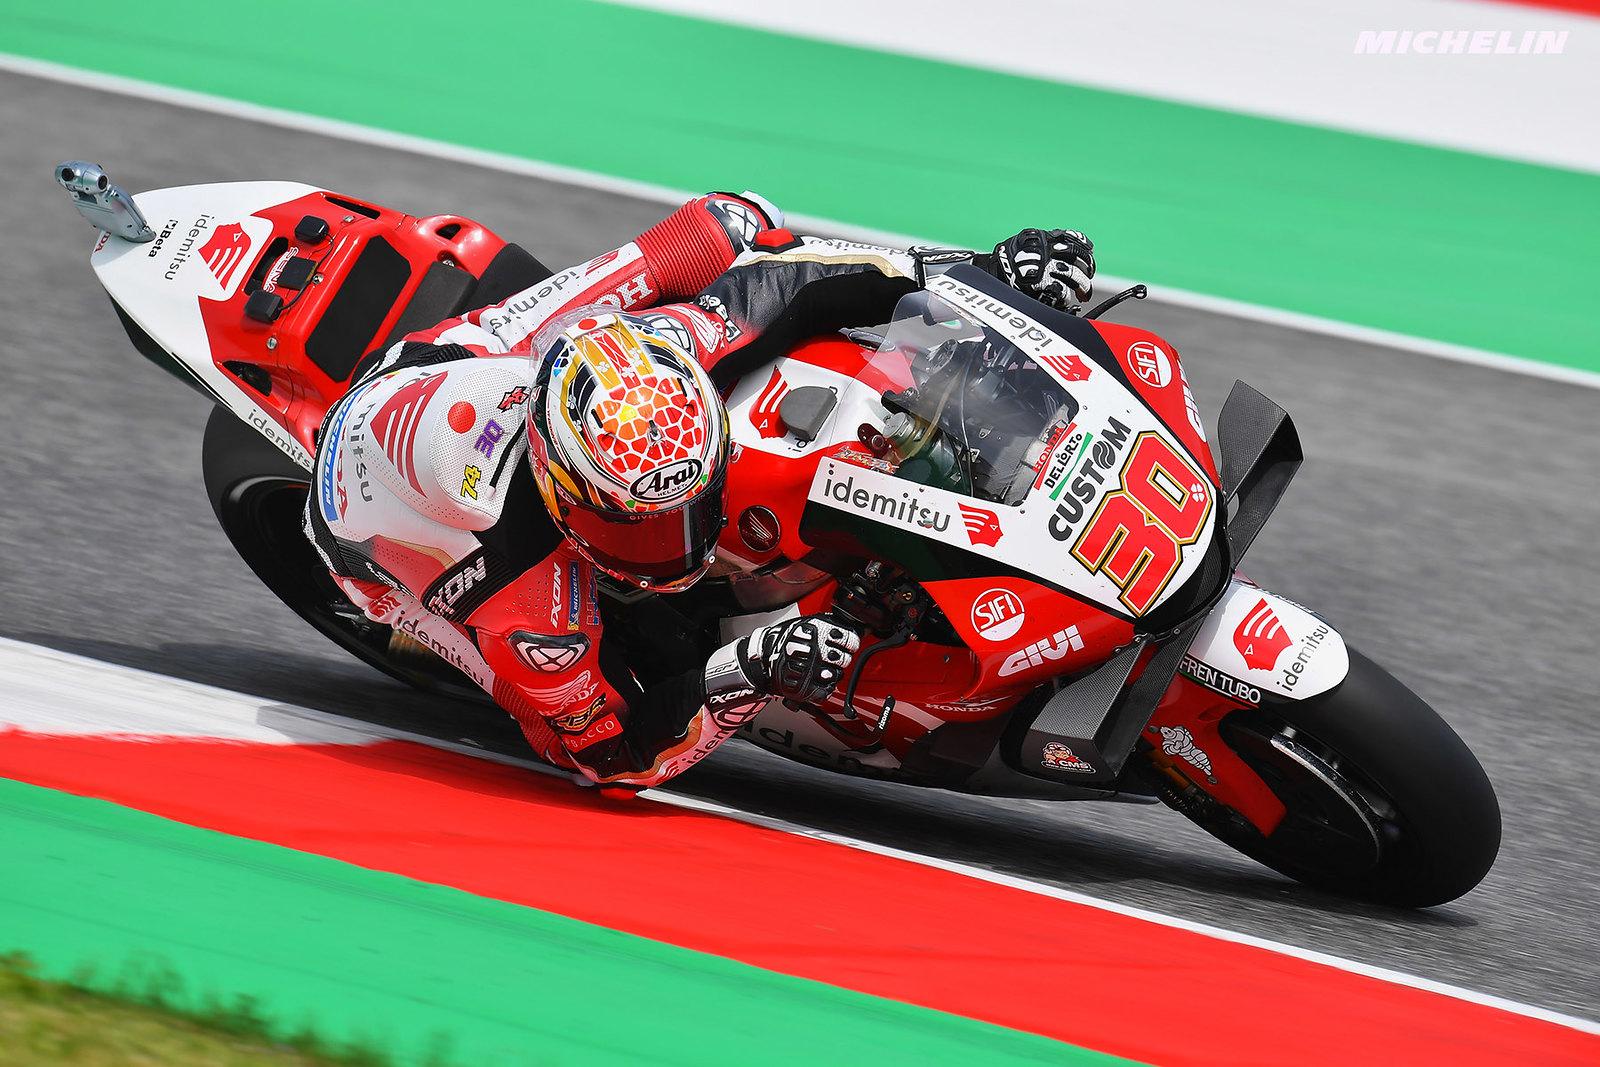 MotoGP2021イタリアGP 15位中上 貴晶「Q2に進出出来るポテンシャルはあった」